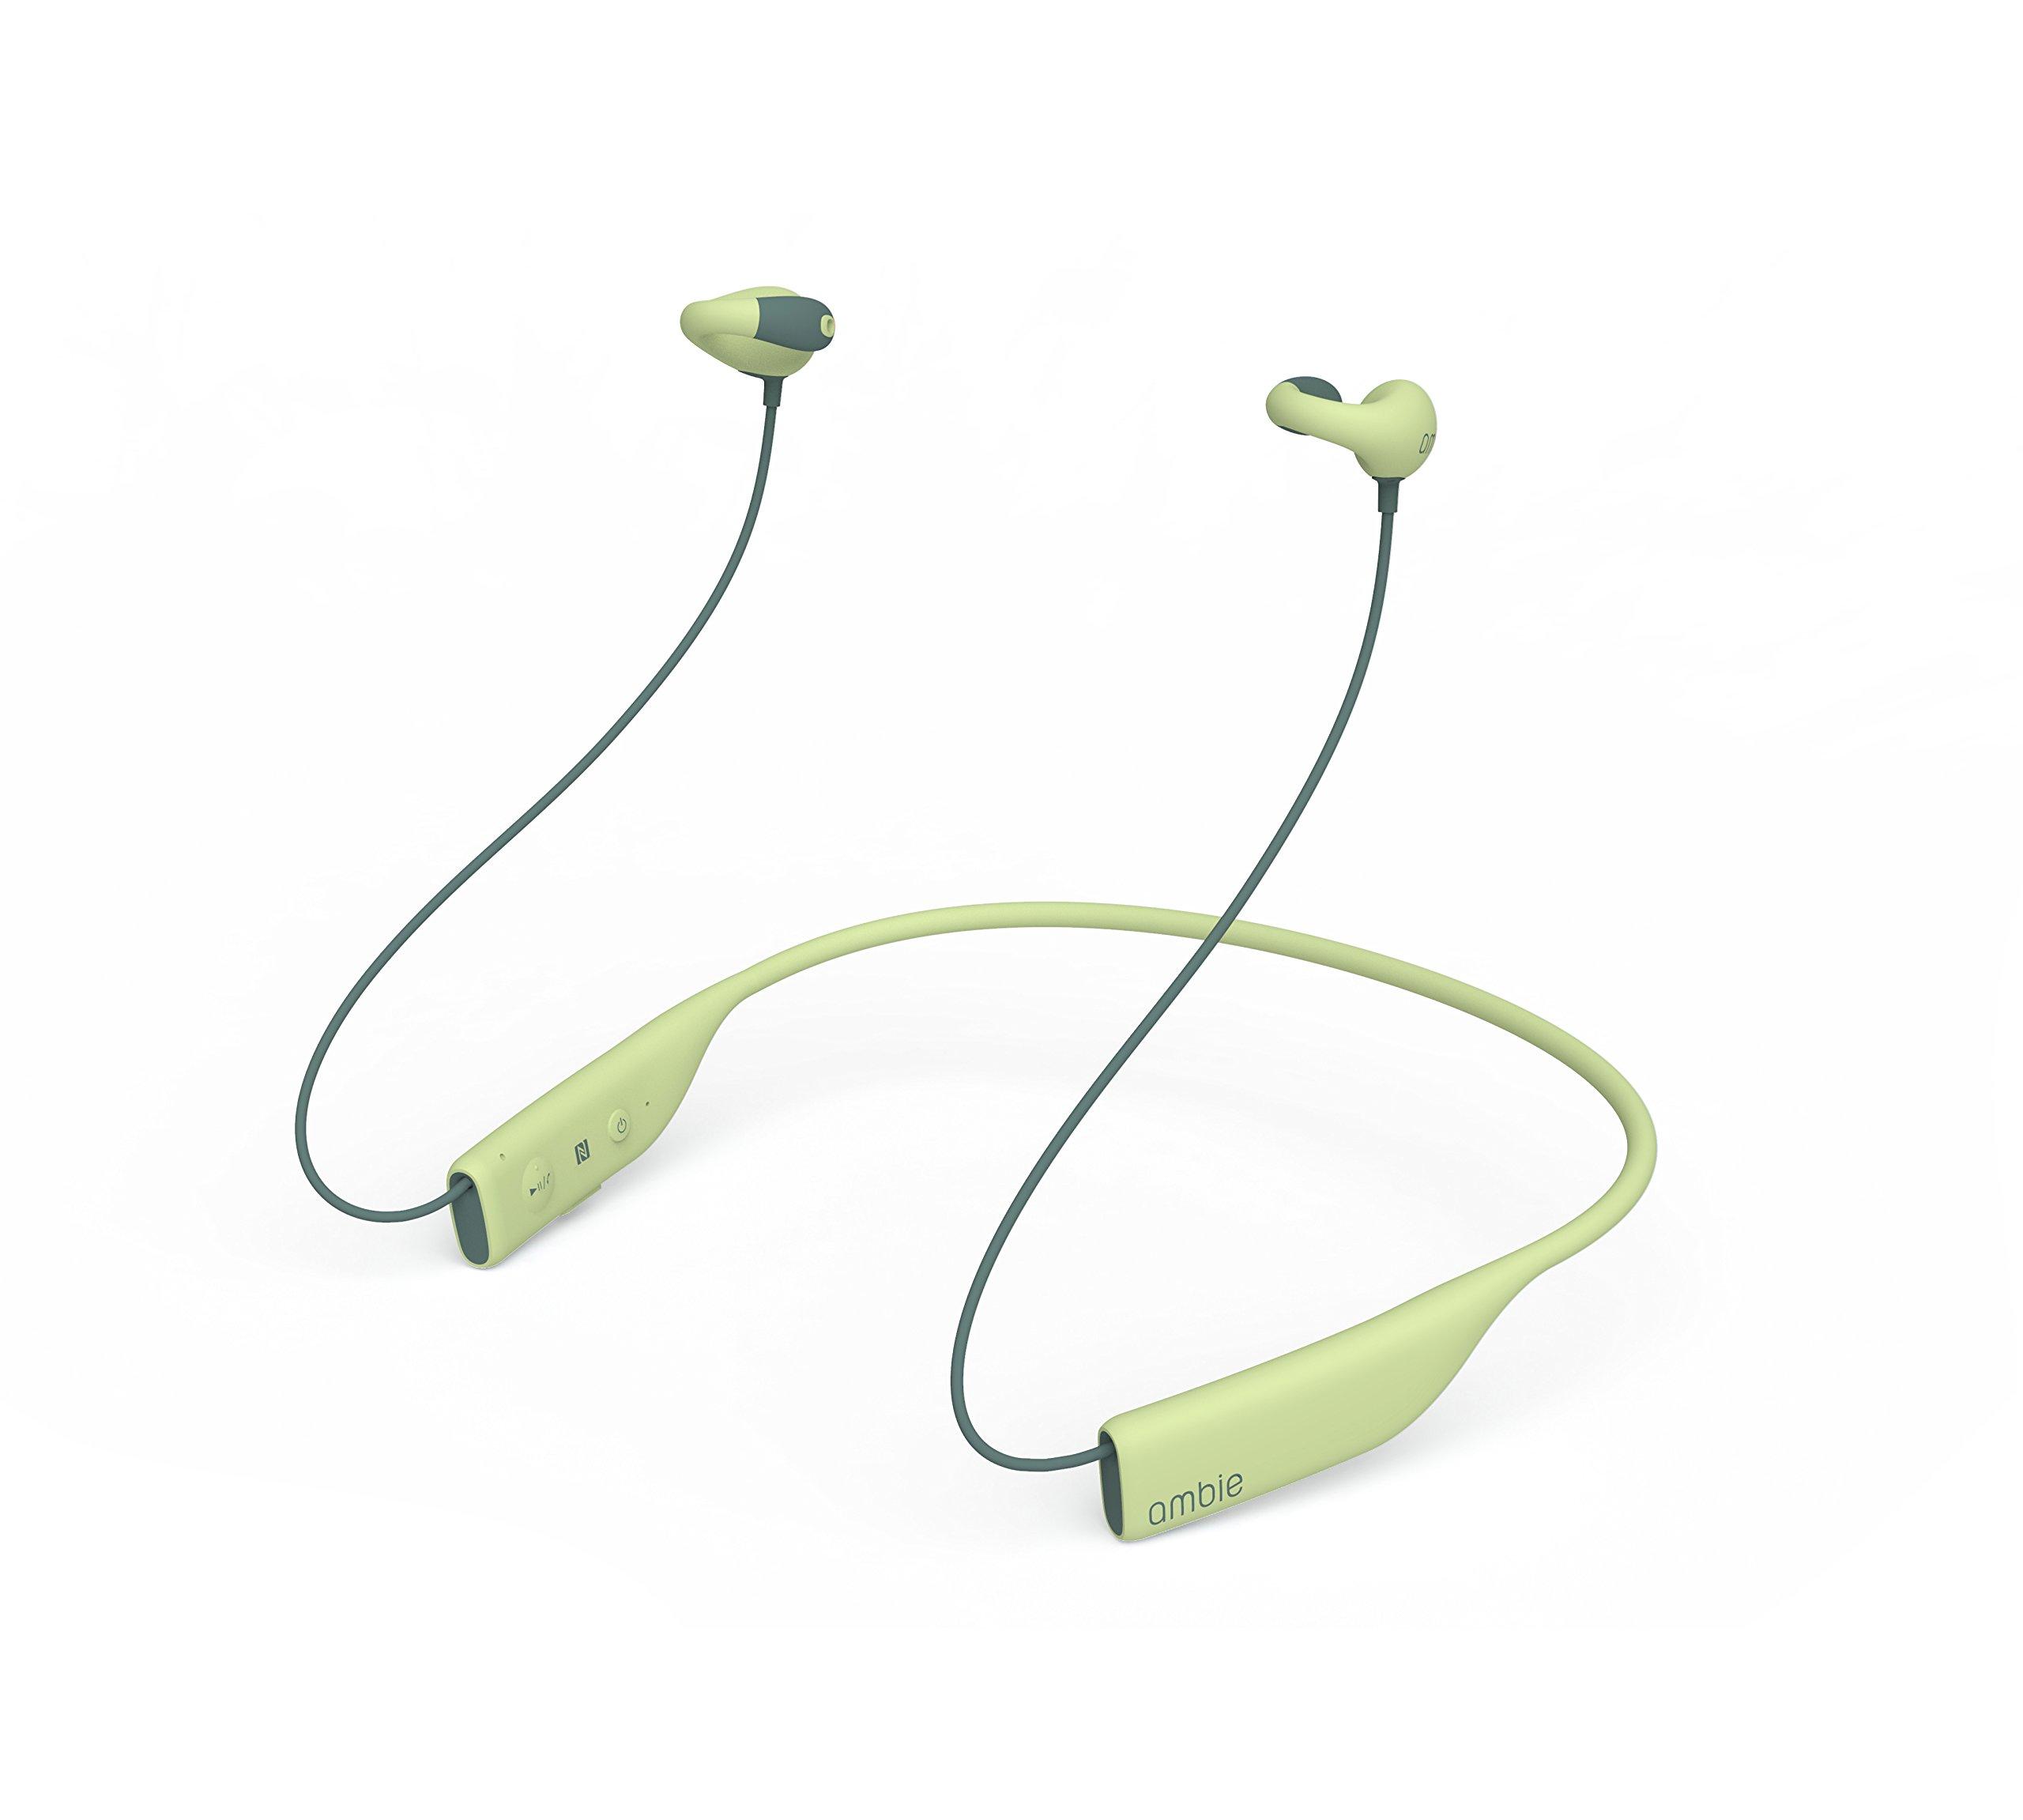 ambie wireless earcuffs(アンビー ワイヤレスイヤカフ) (Cactus Green)